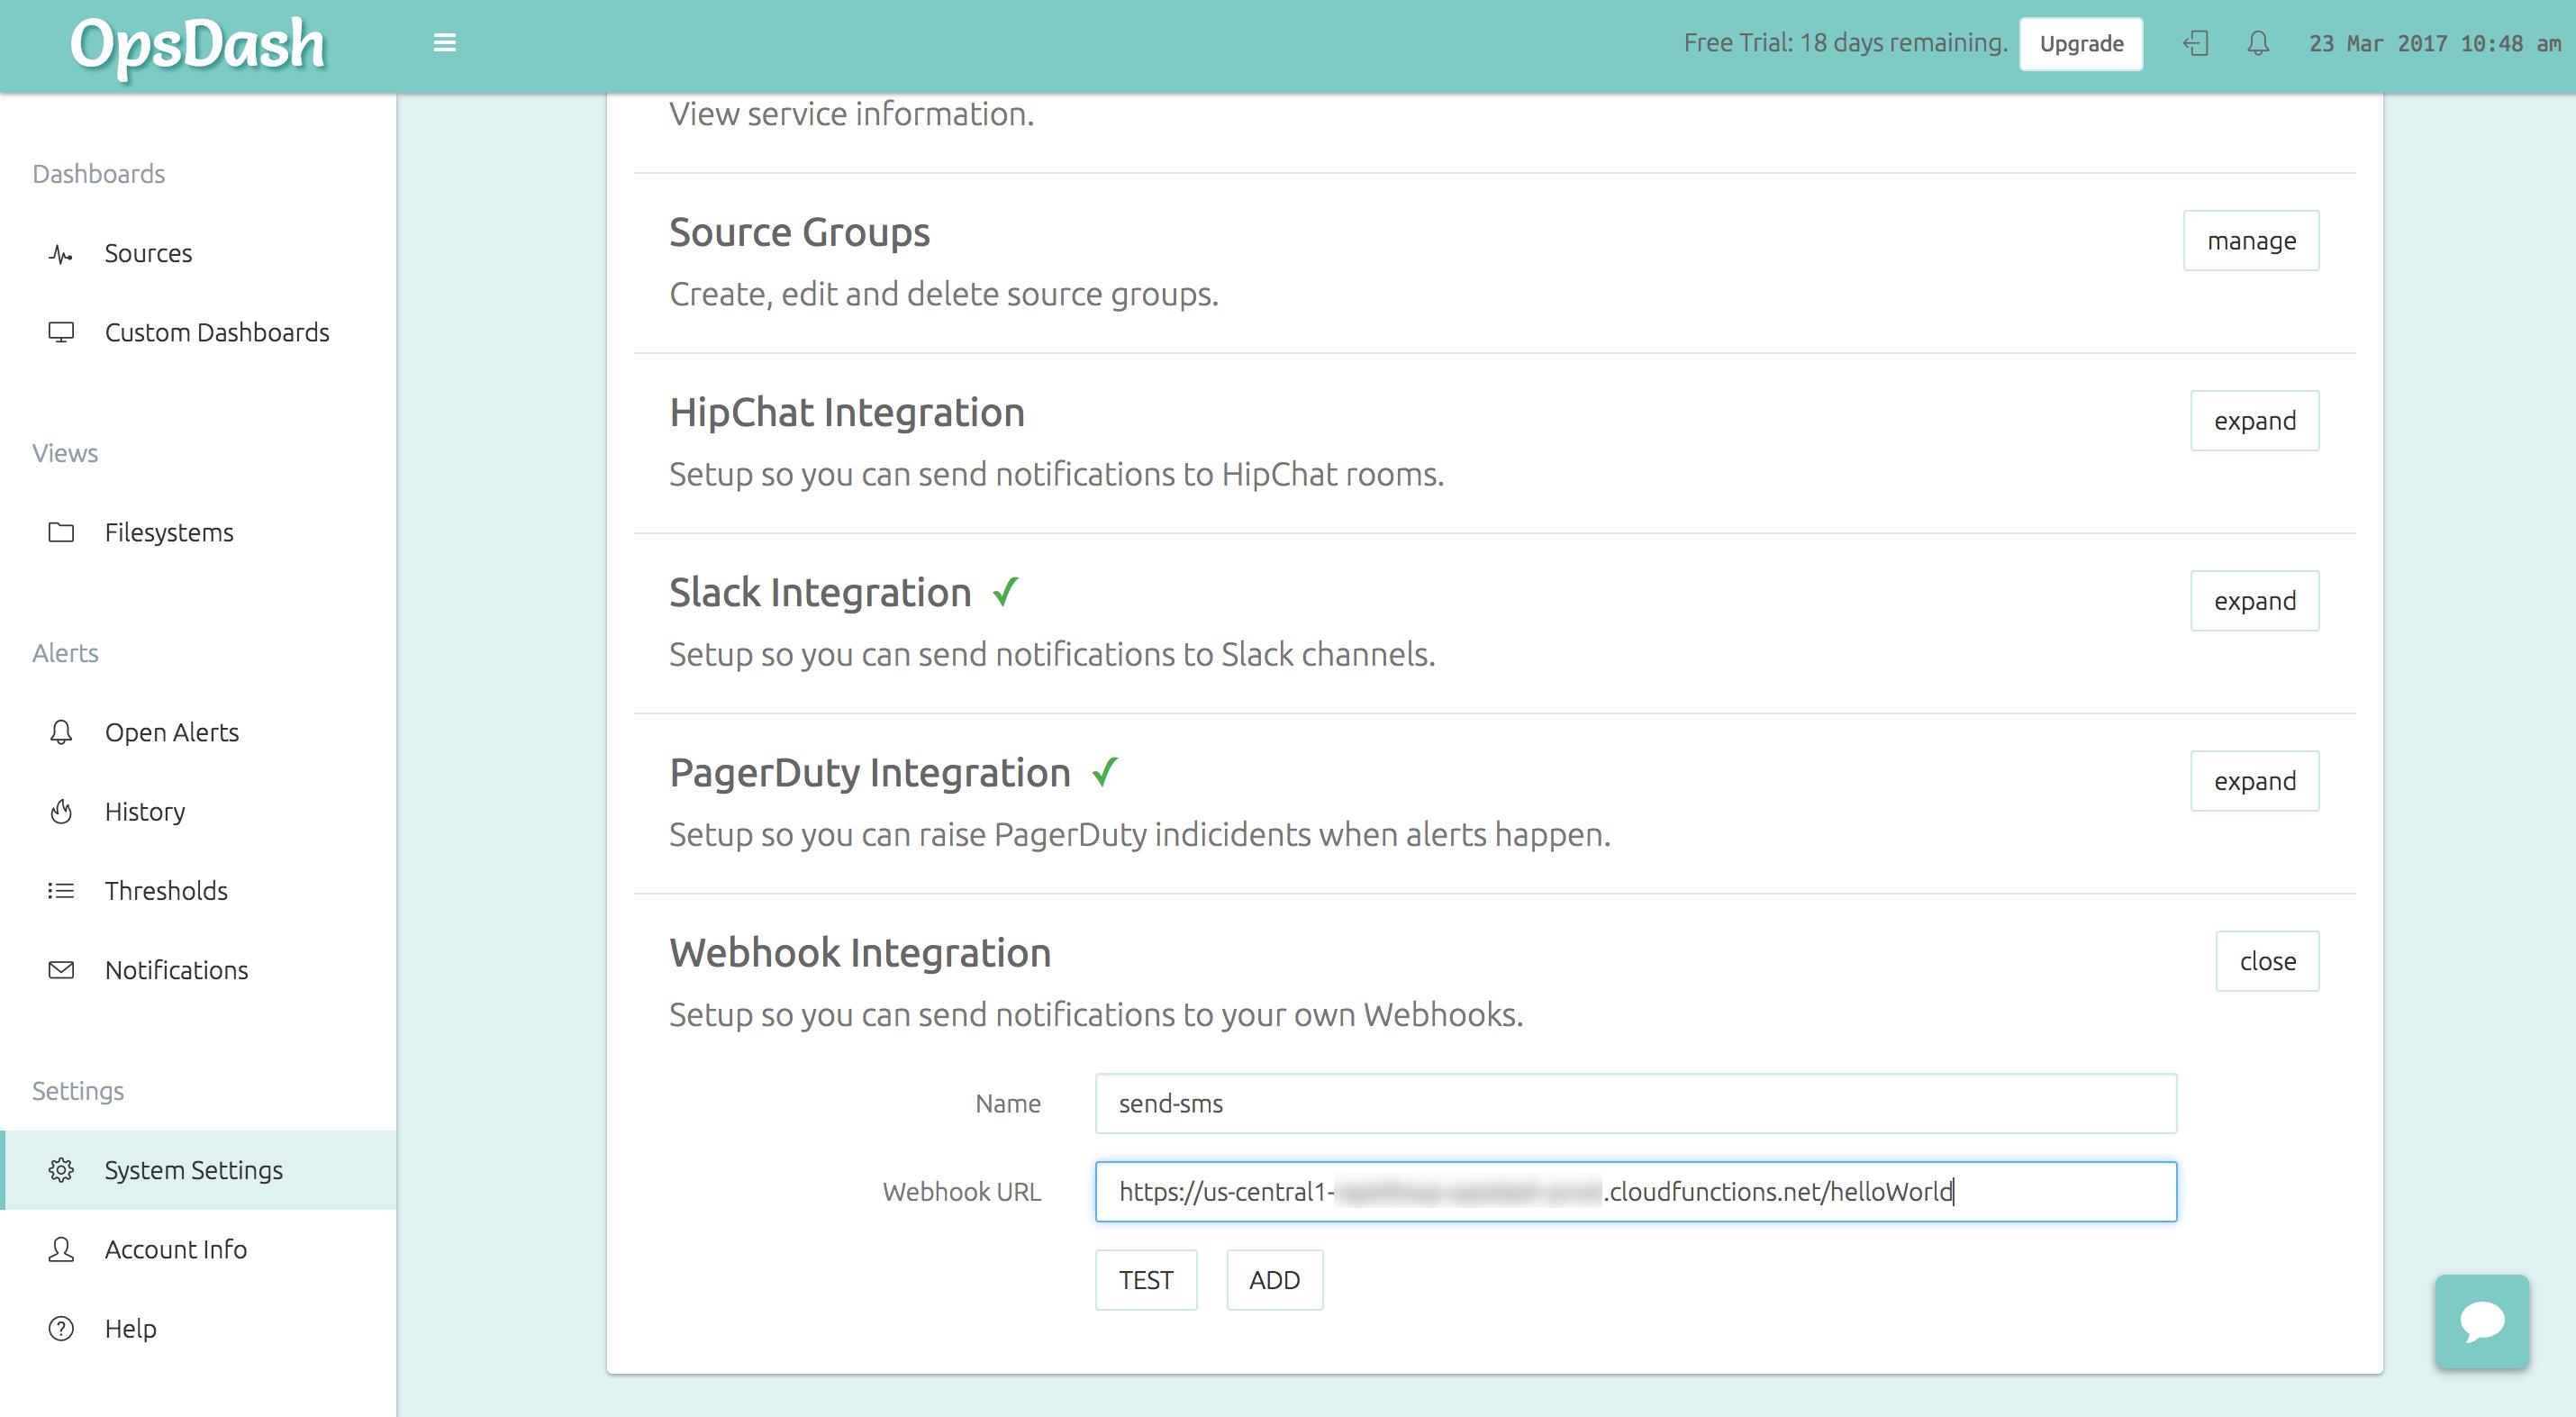 Hosting Your Webhooks using Google Cloud Functions - OpsDash